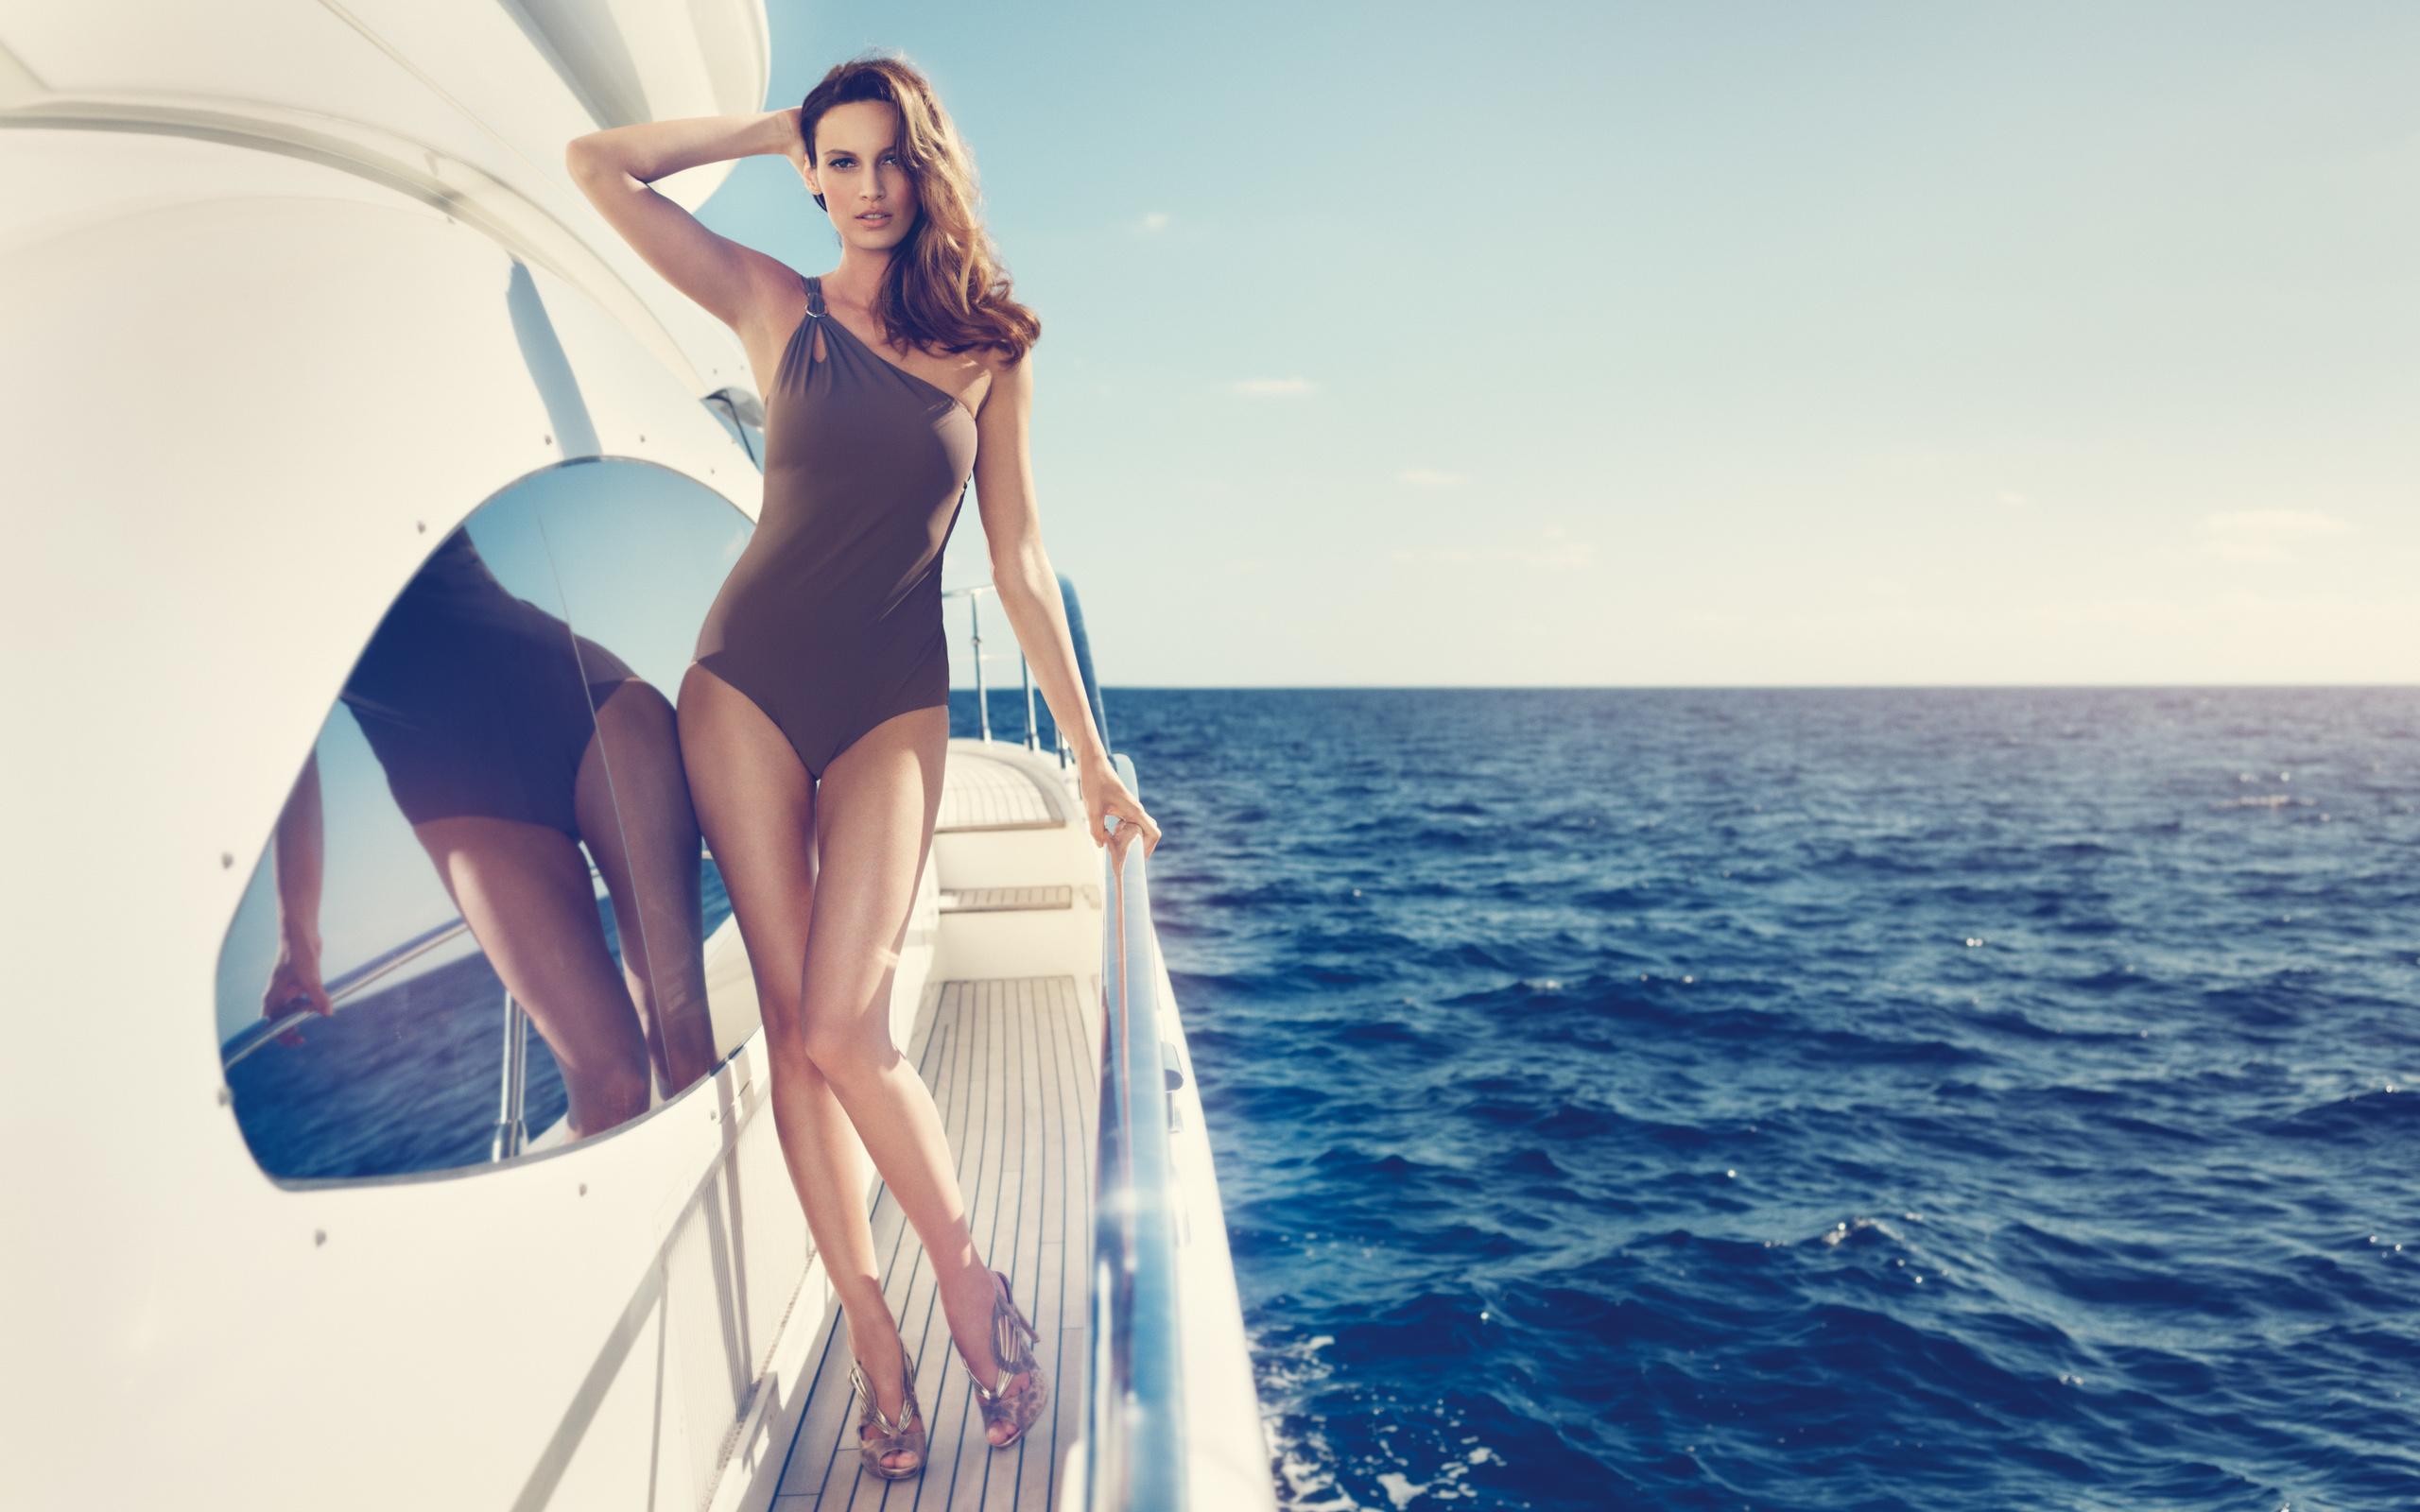 Женщина на яхте картинки фото, оральный секс фото онлайн